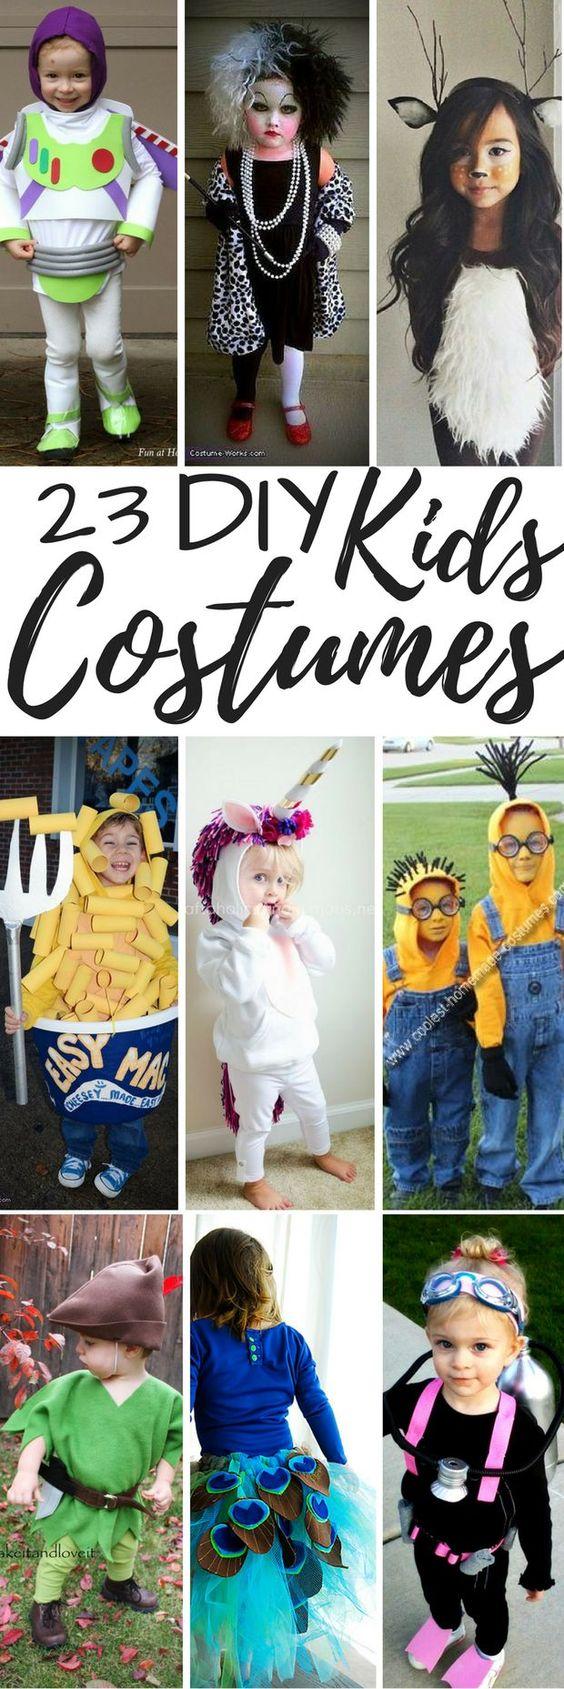 23 DIY Kids Costumes